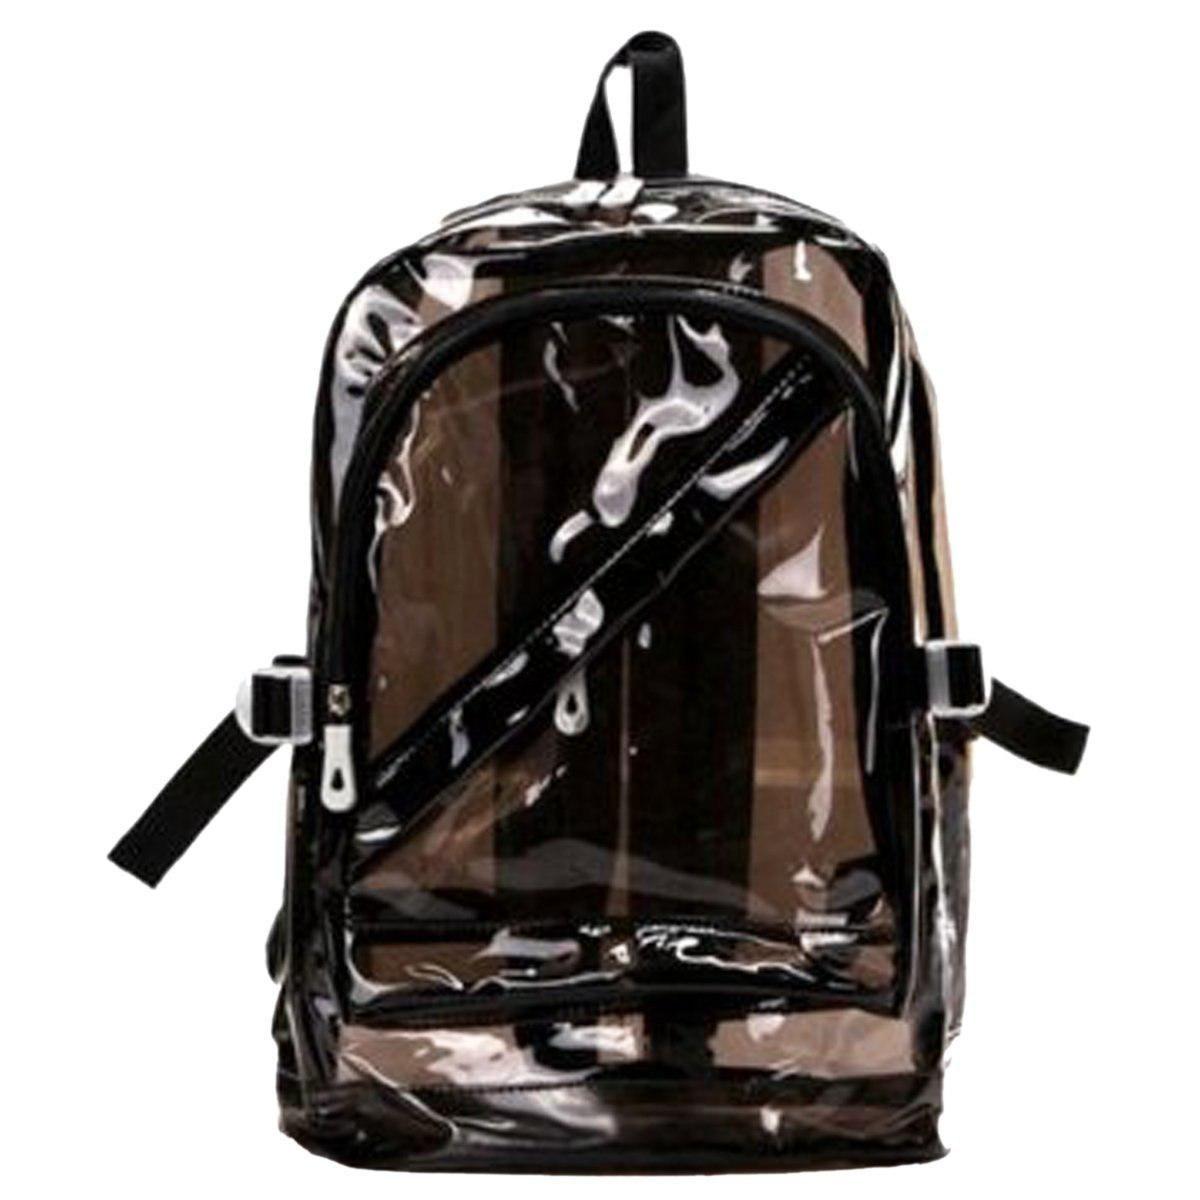 9b37e8b012 TFTP Sweety Women Girl Zipped Fashion Transparent Clear Backpack Plastic Bag  School Bag Bookbag